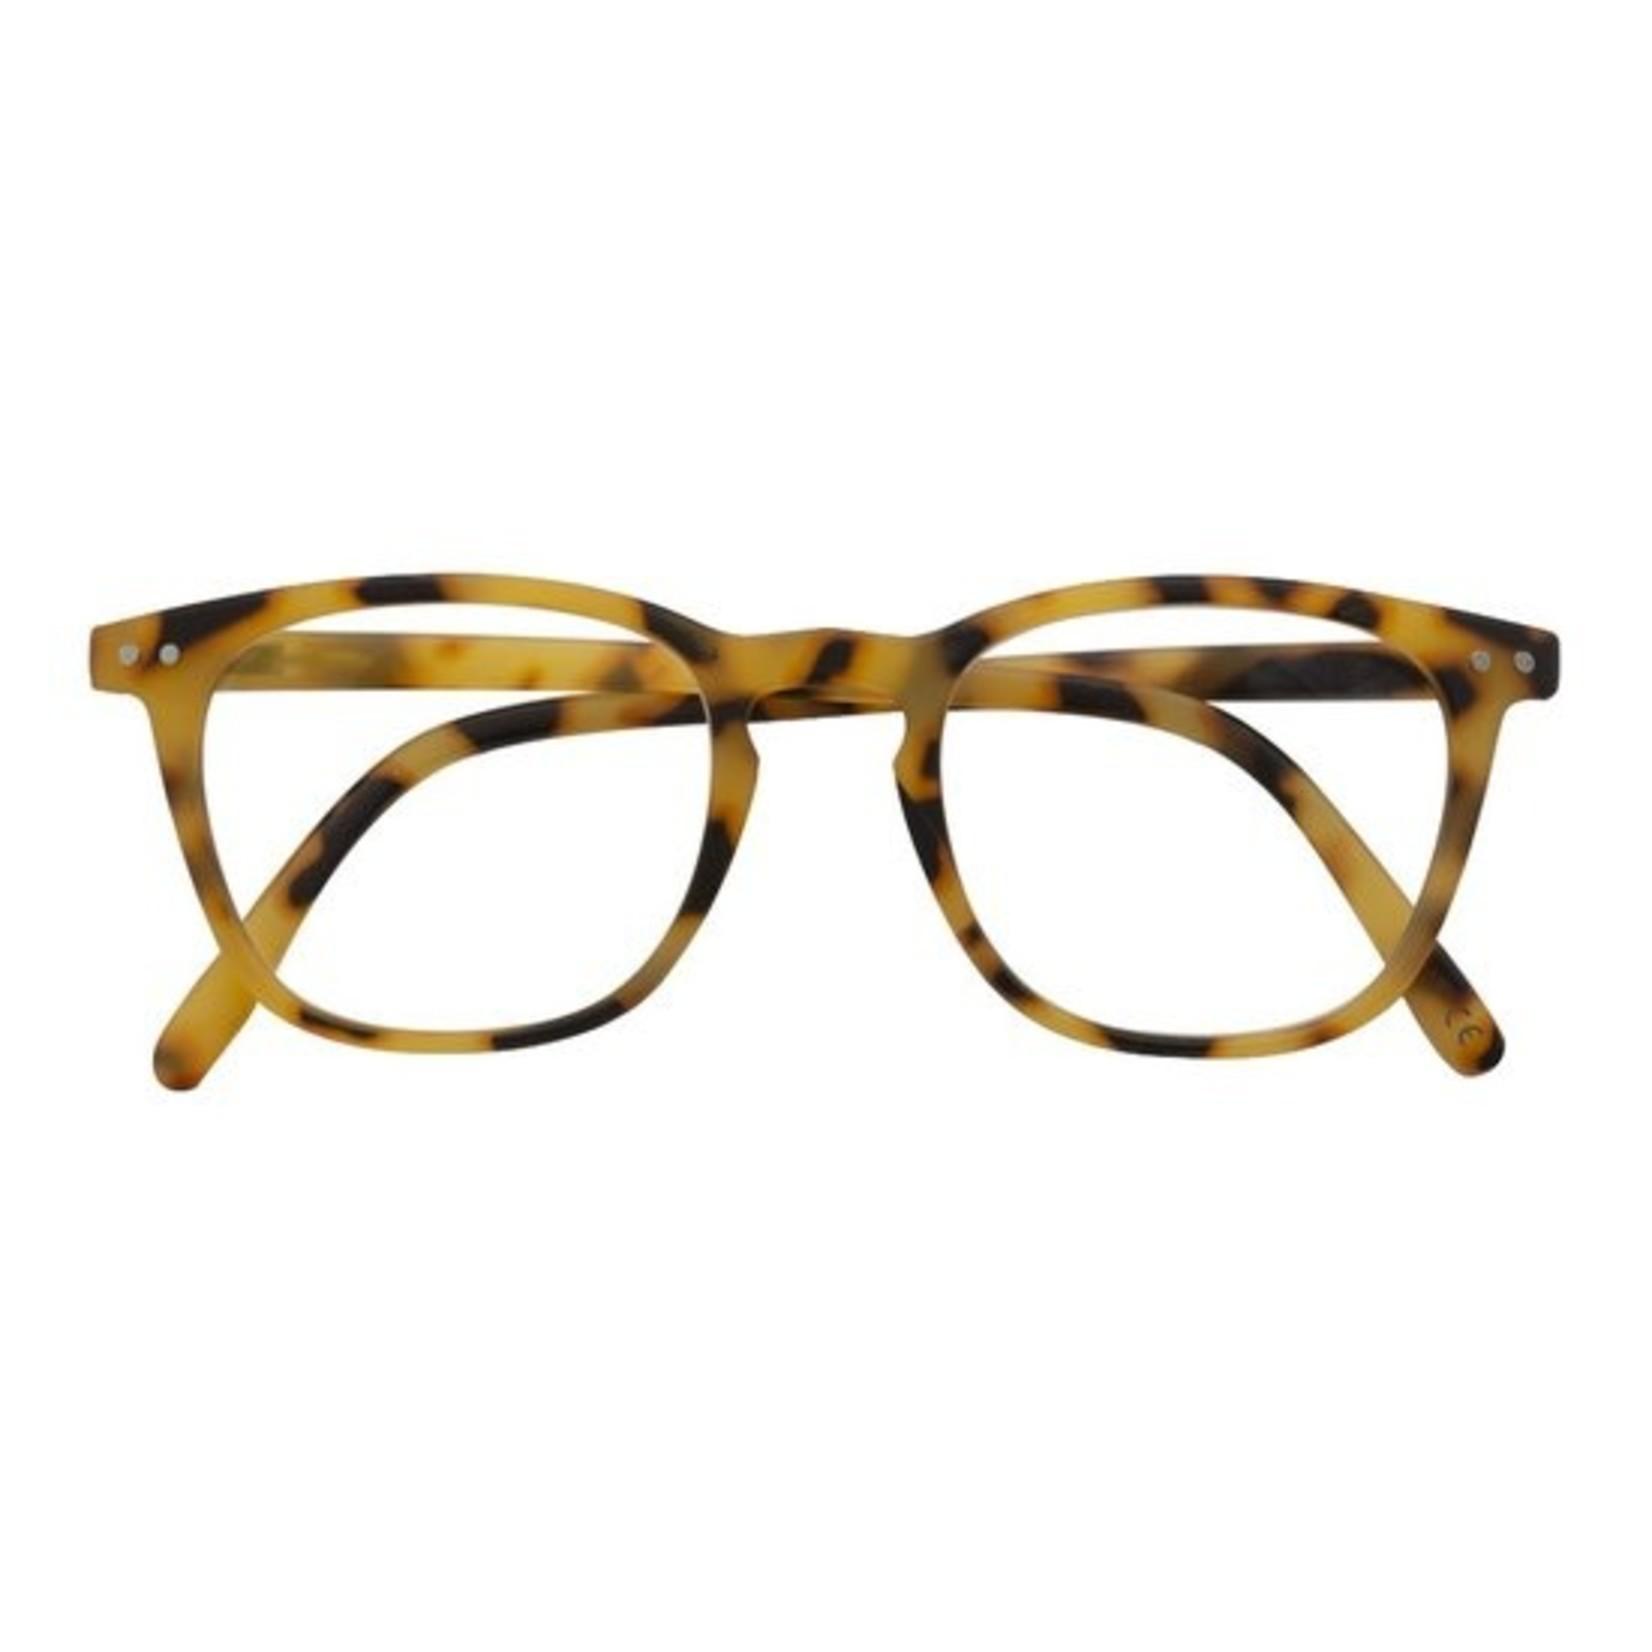 Croon Alex Havanna Ocher leesbril